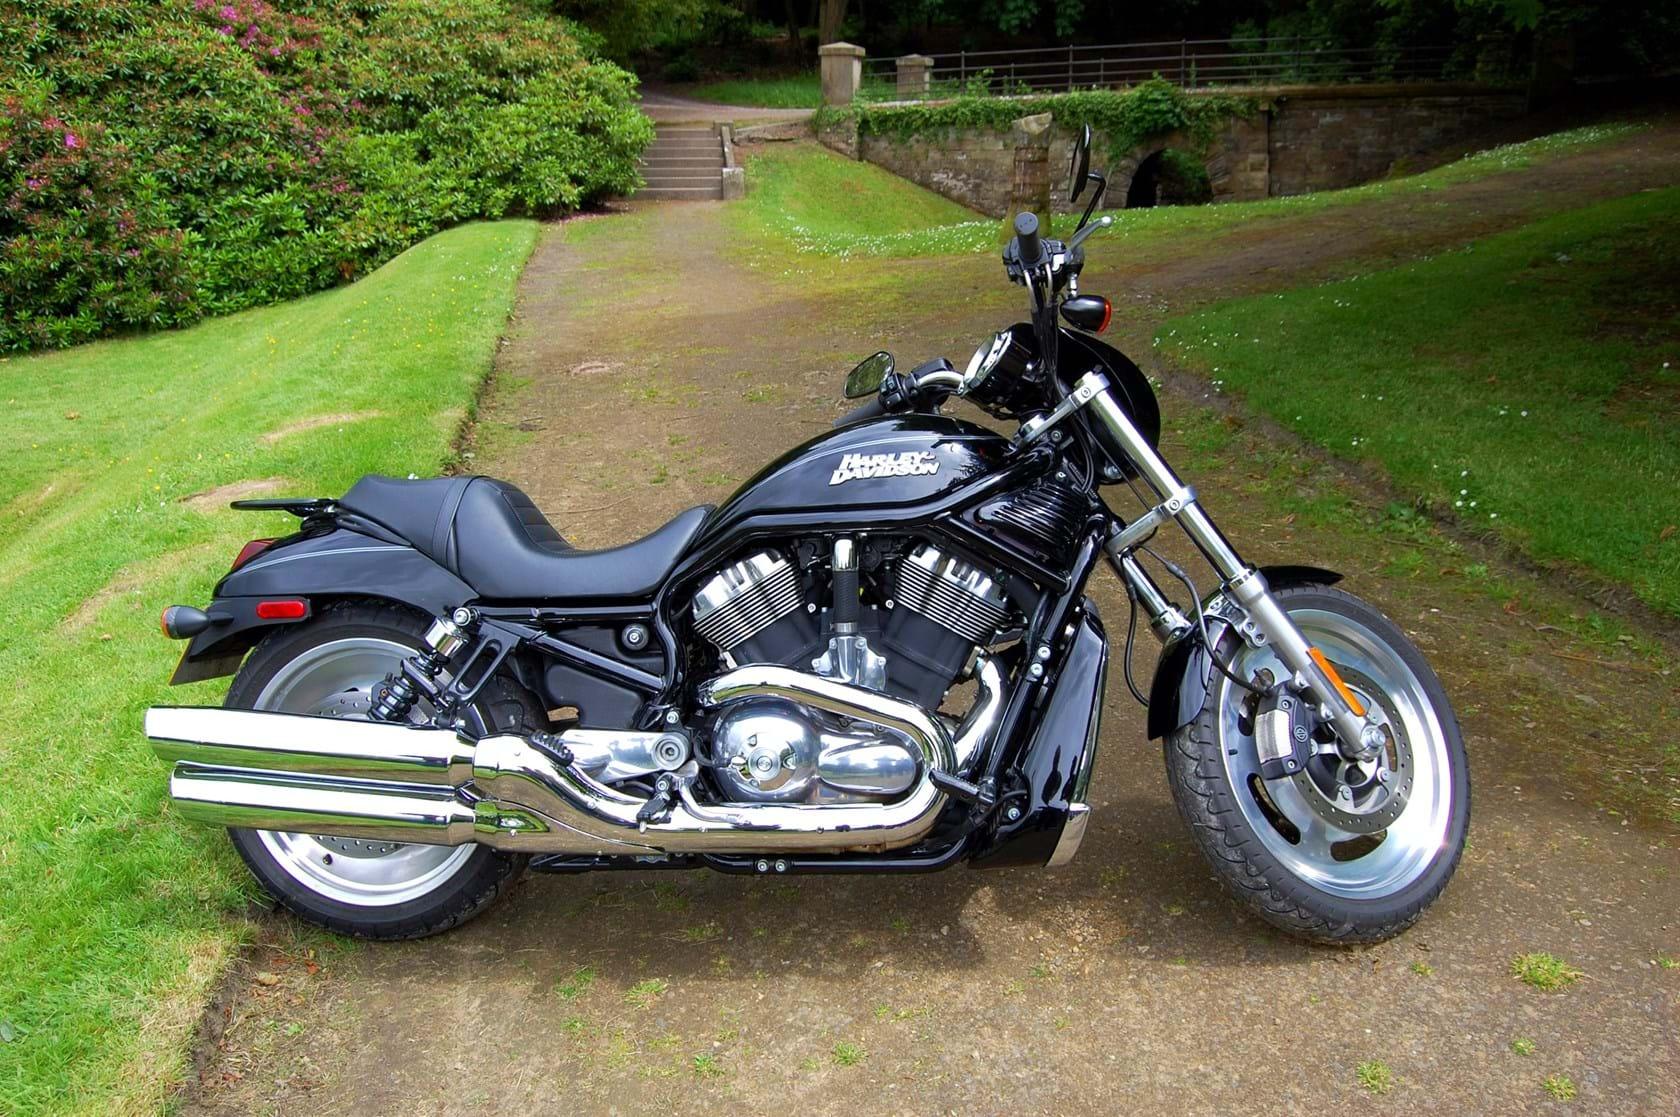 Harley Davidson V Rod Review O For Sale Price Guide The Bike Market